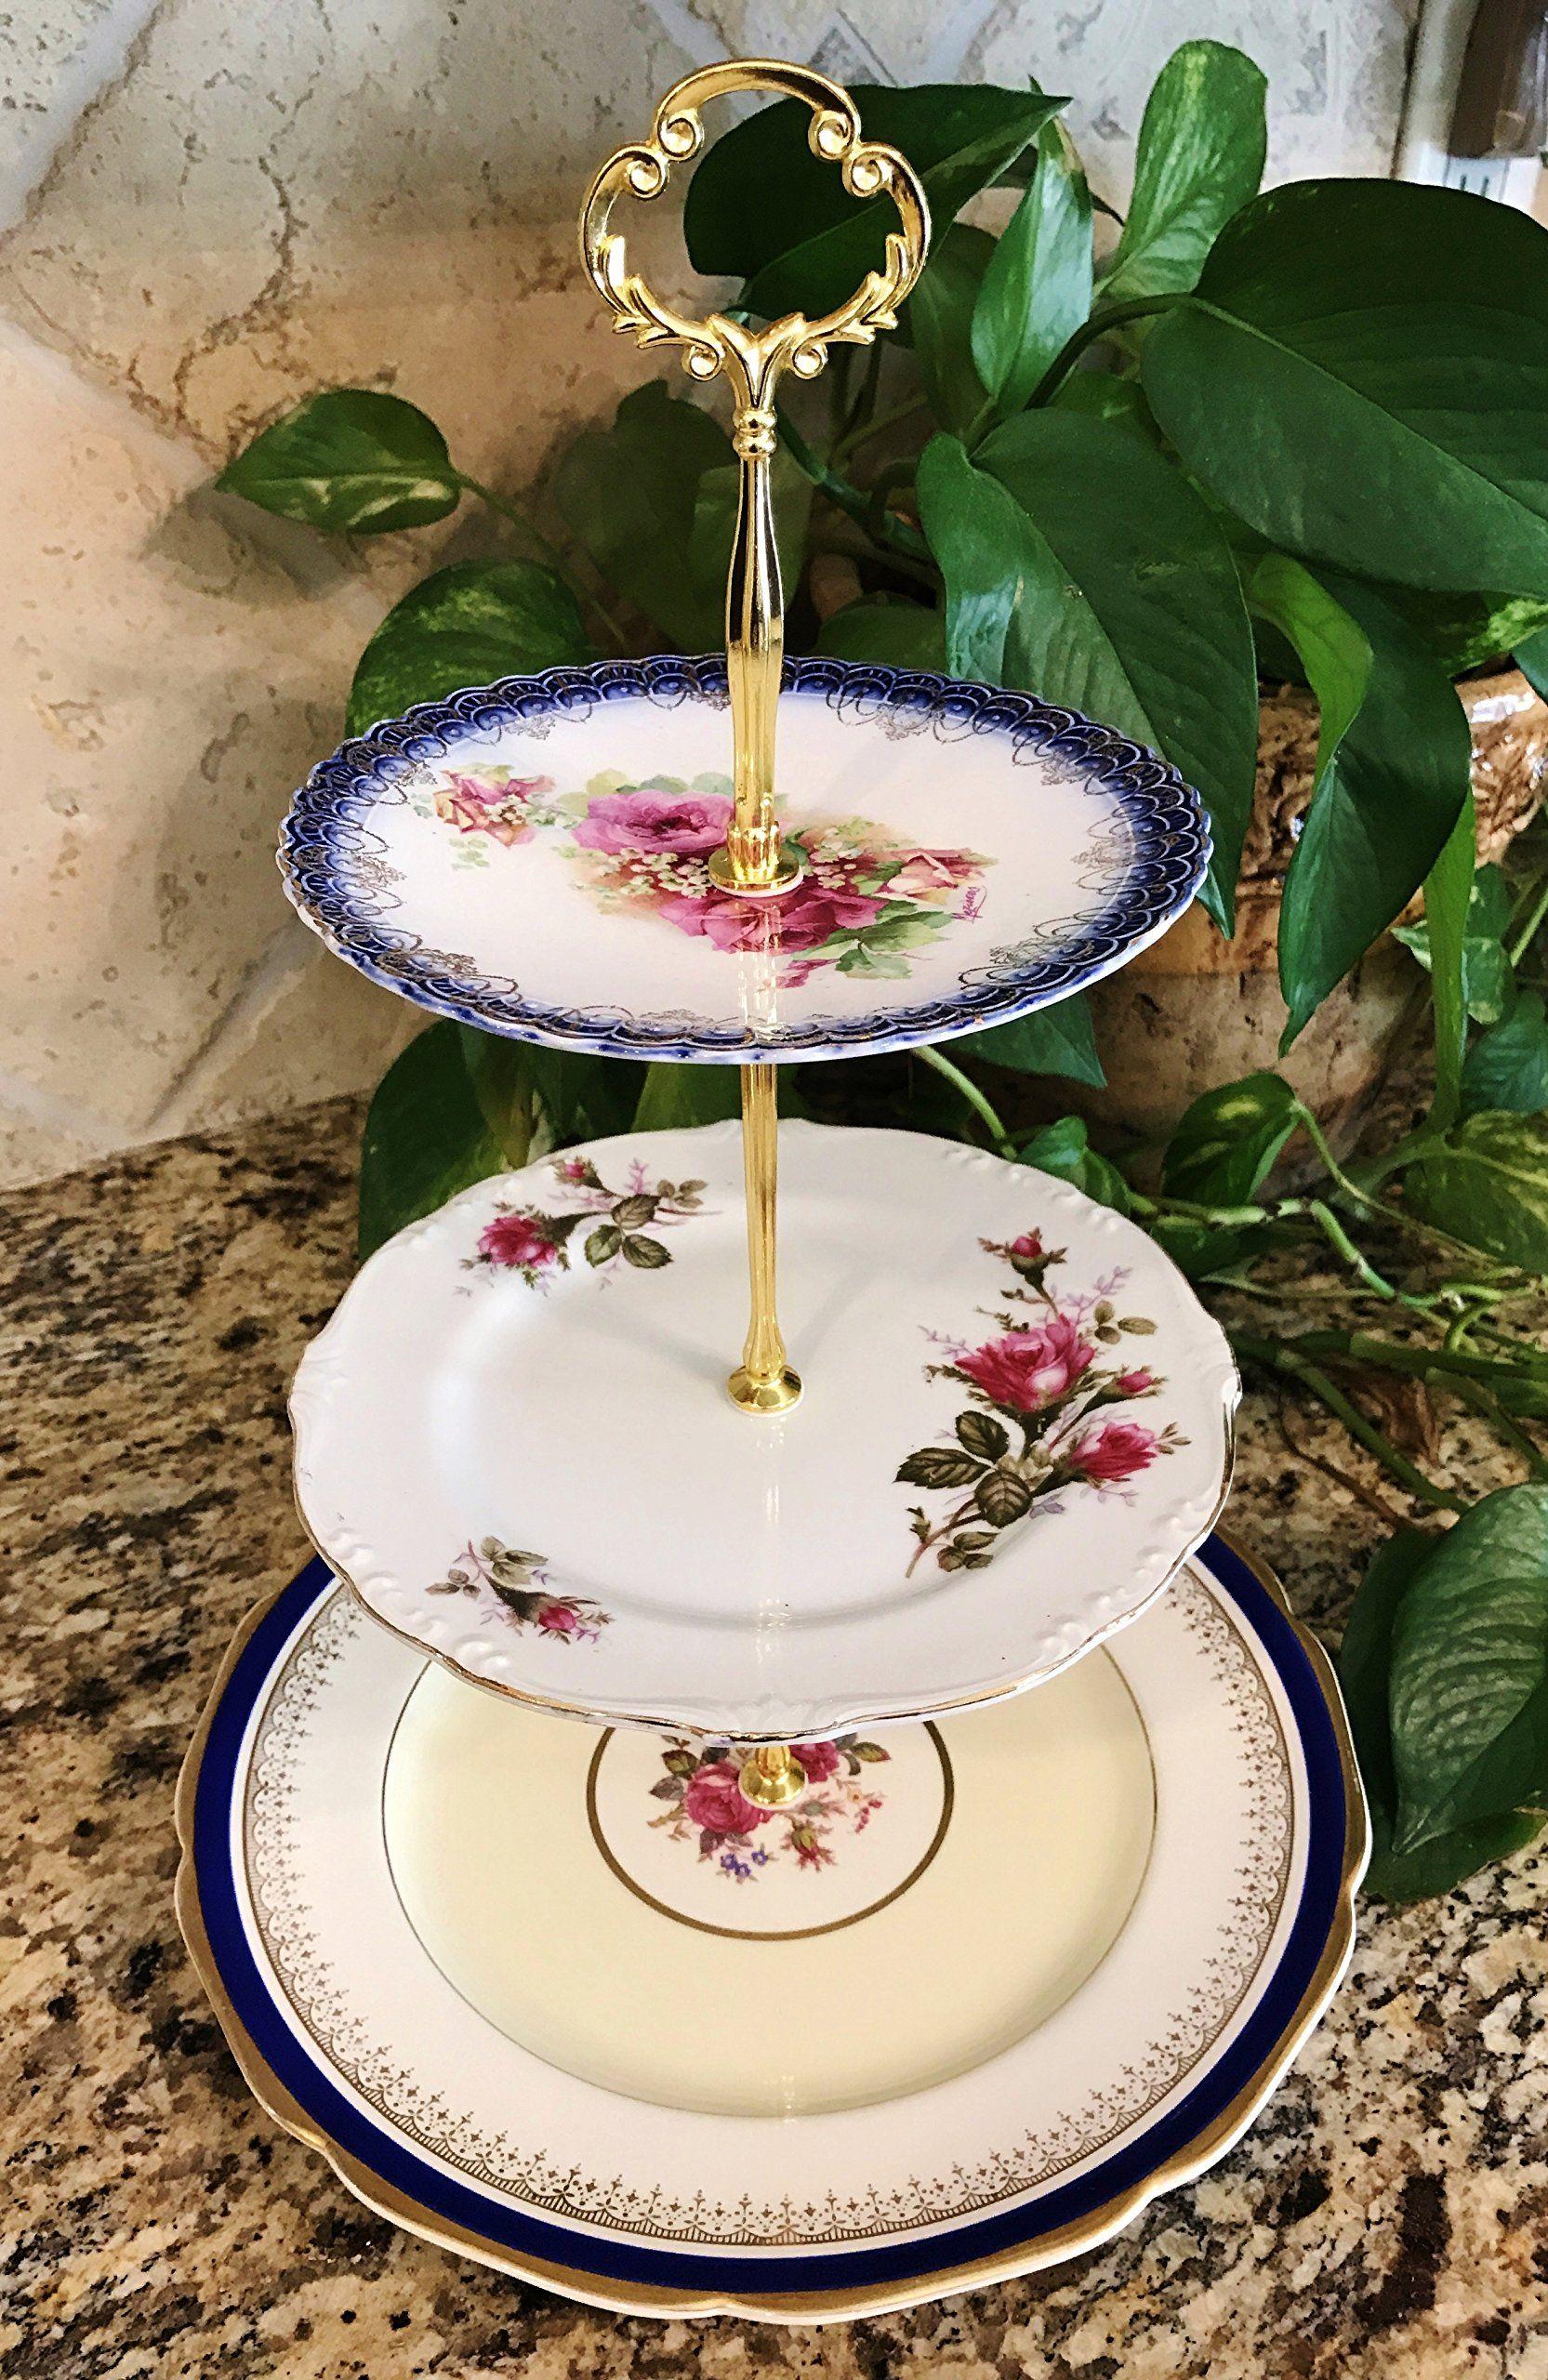 Three tier stand jewelry stand vanity stand cake plate tray